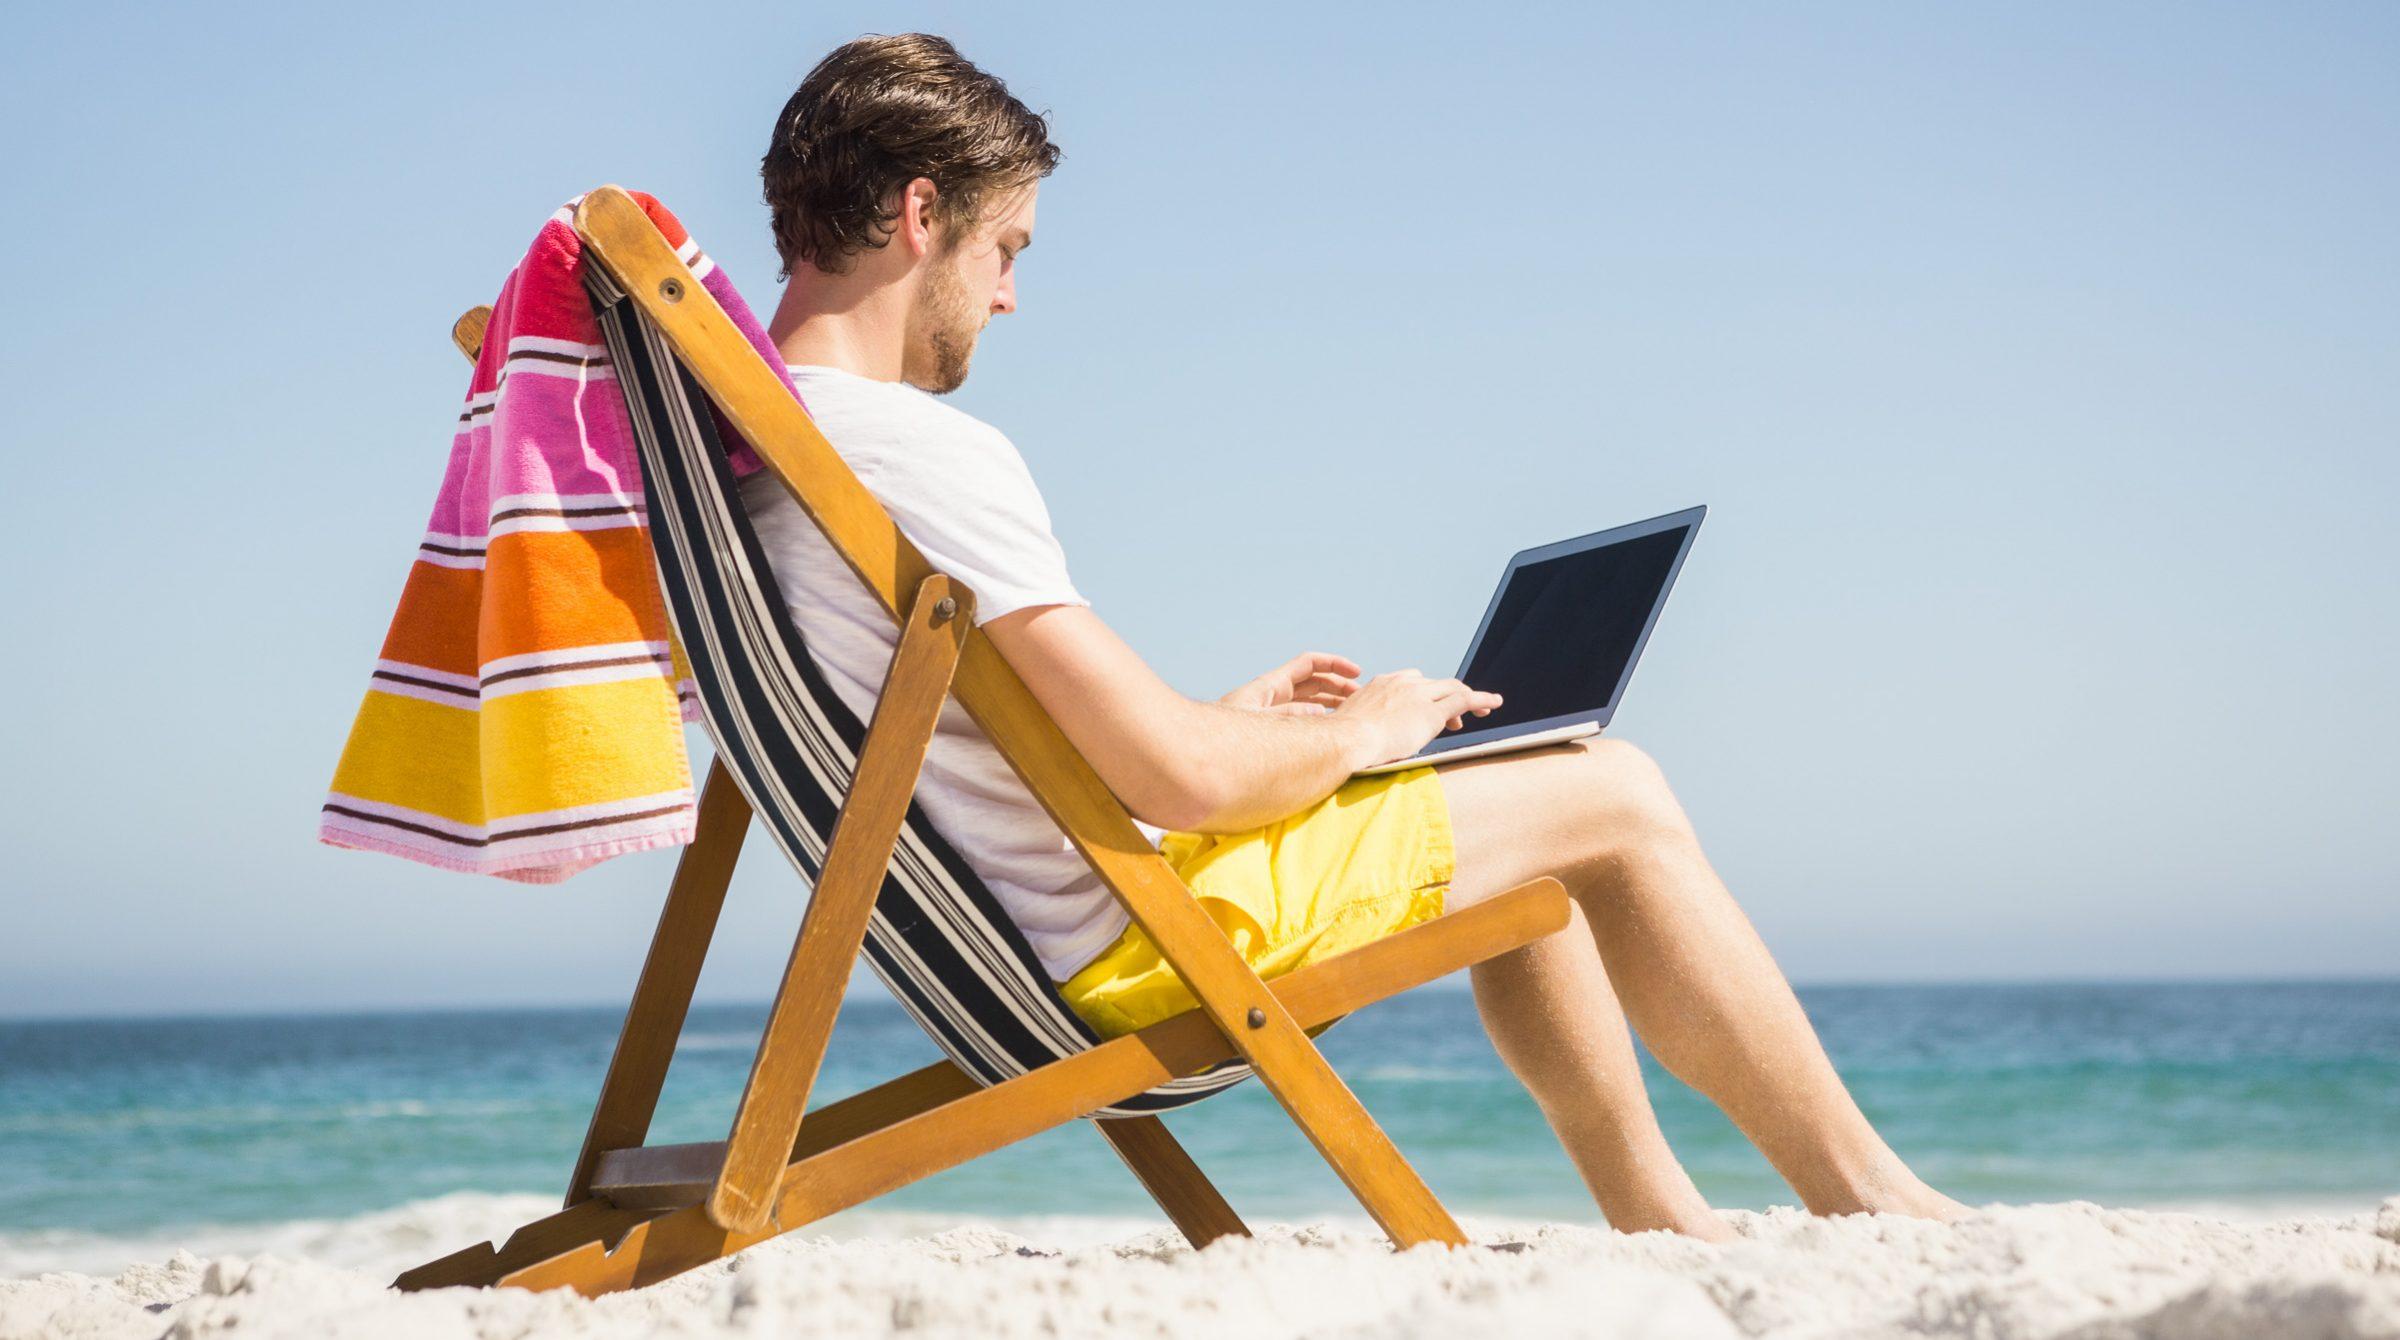 Utbilda dig inom ArcGIS i sommar